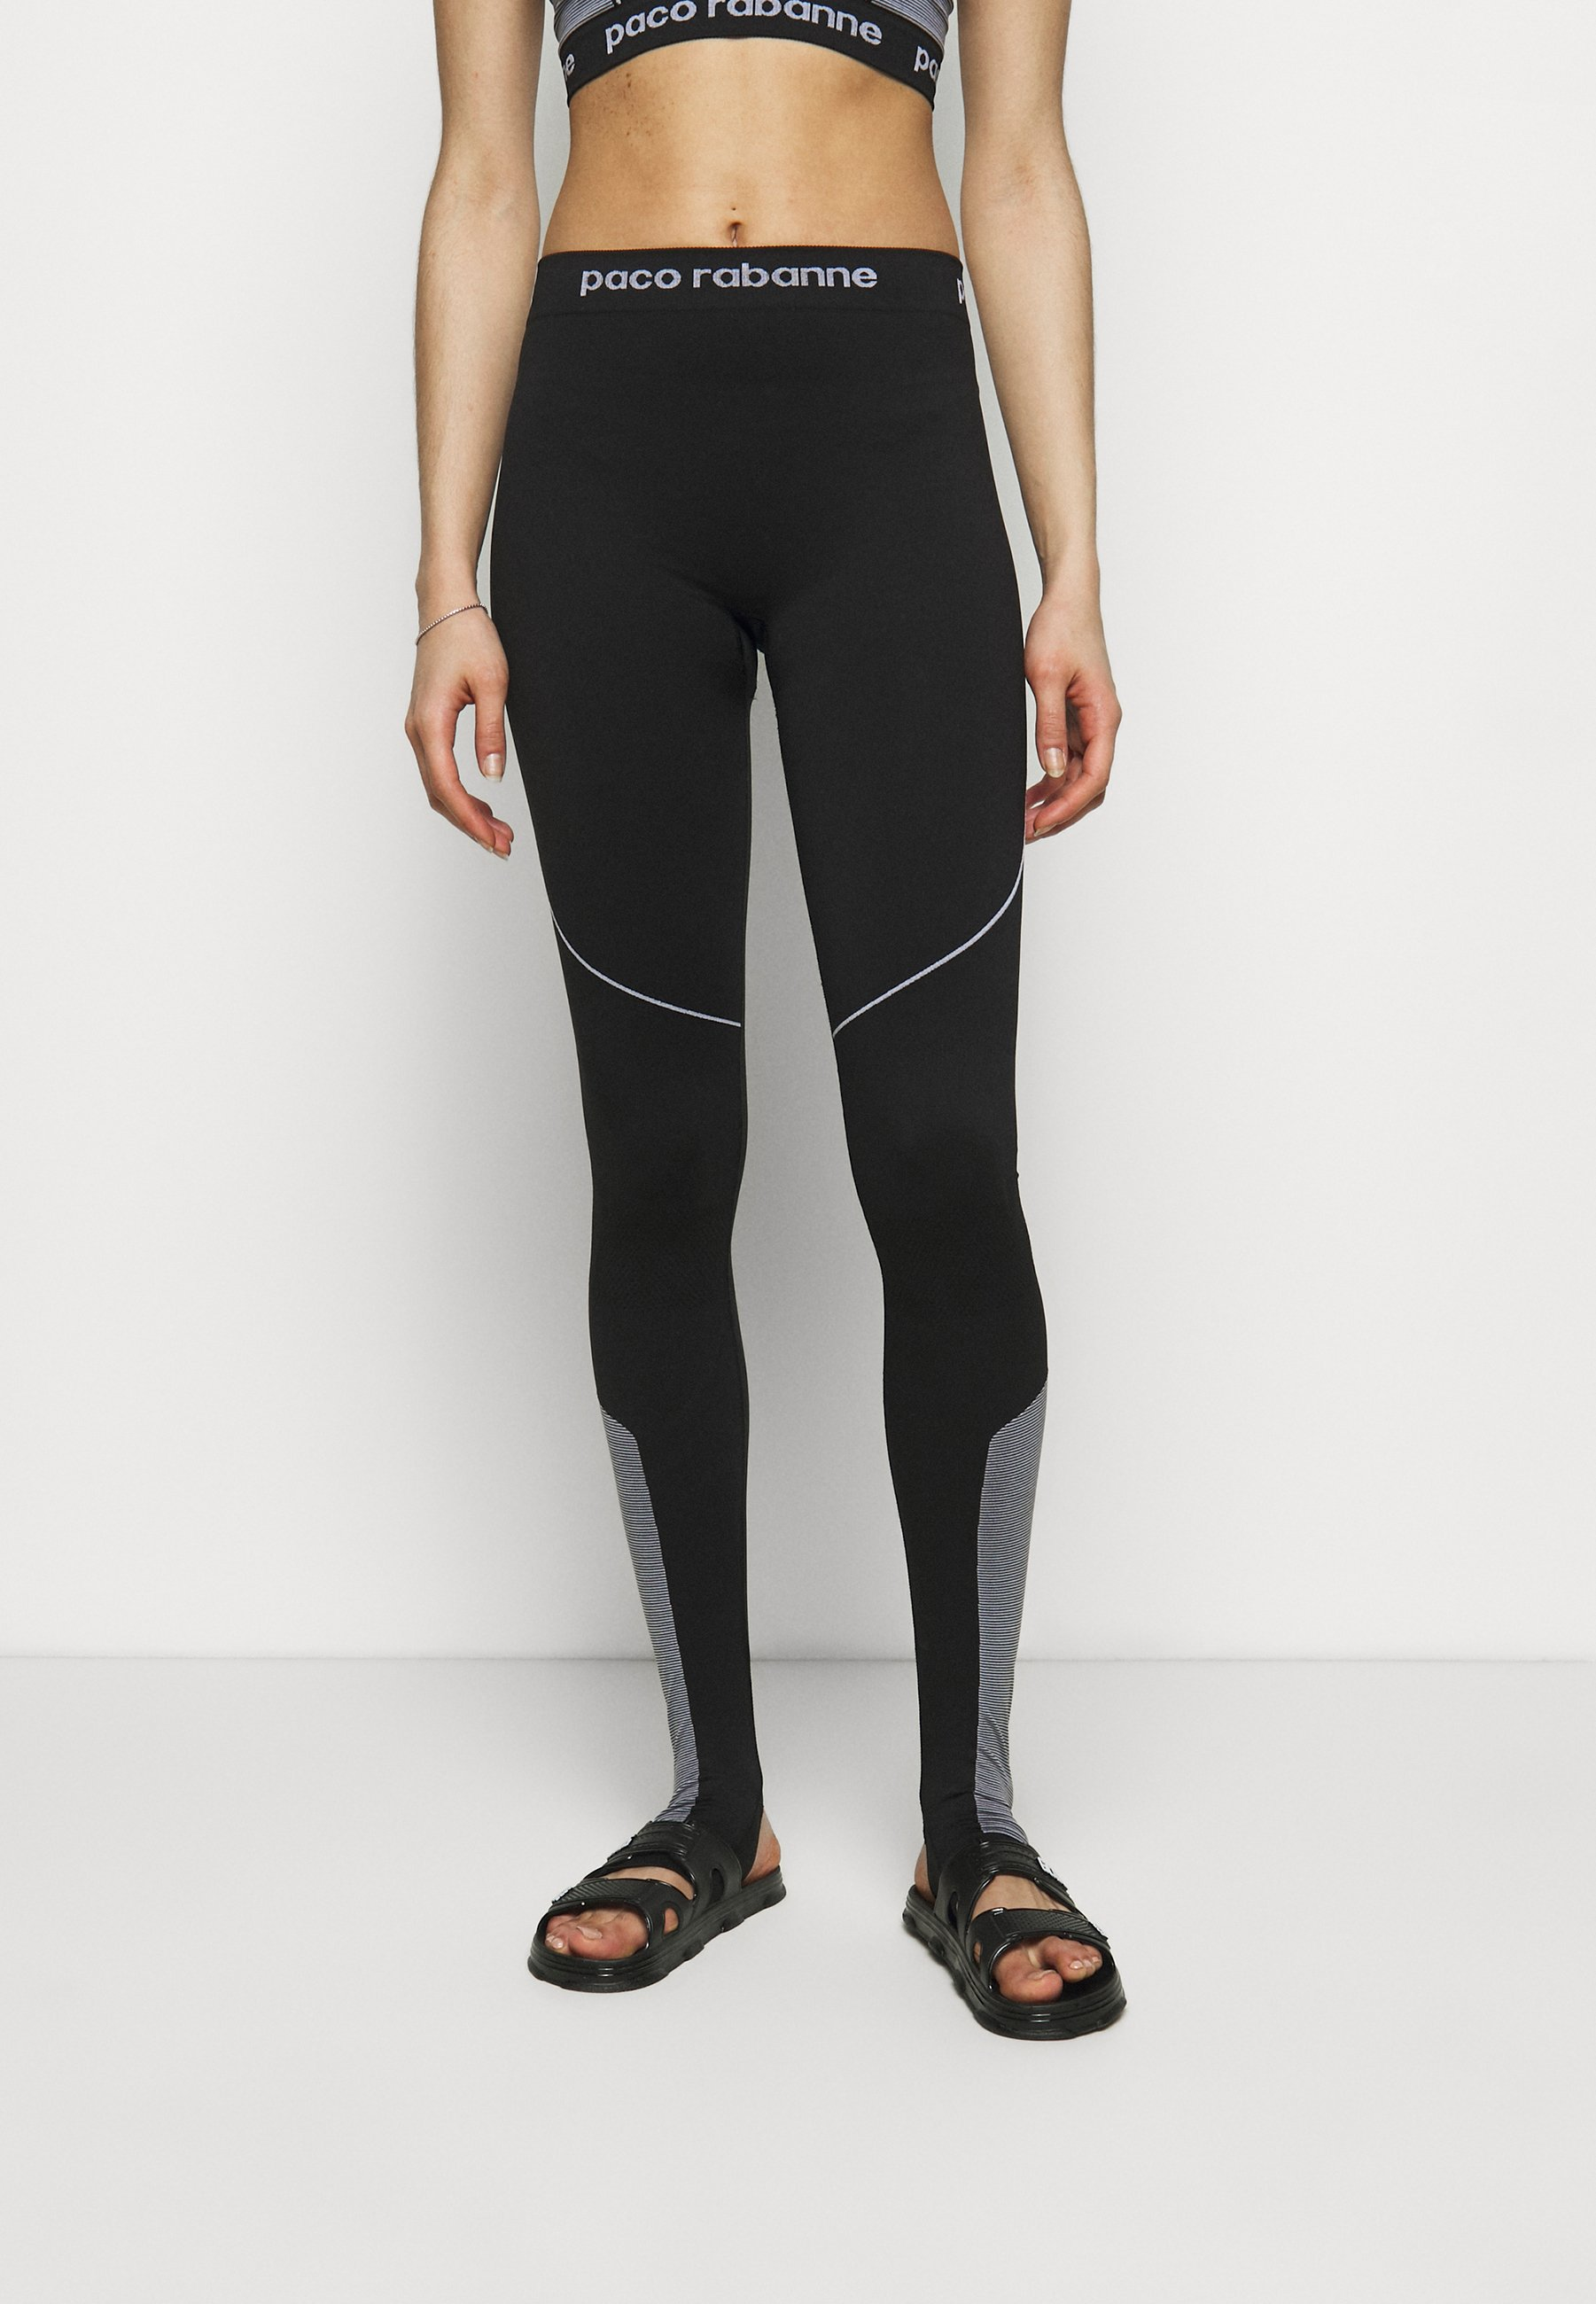 Damen PANTALON - Leggings - Hosen